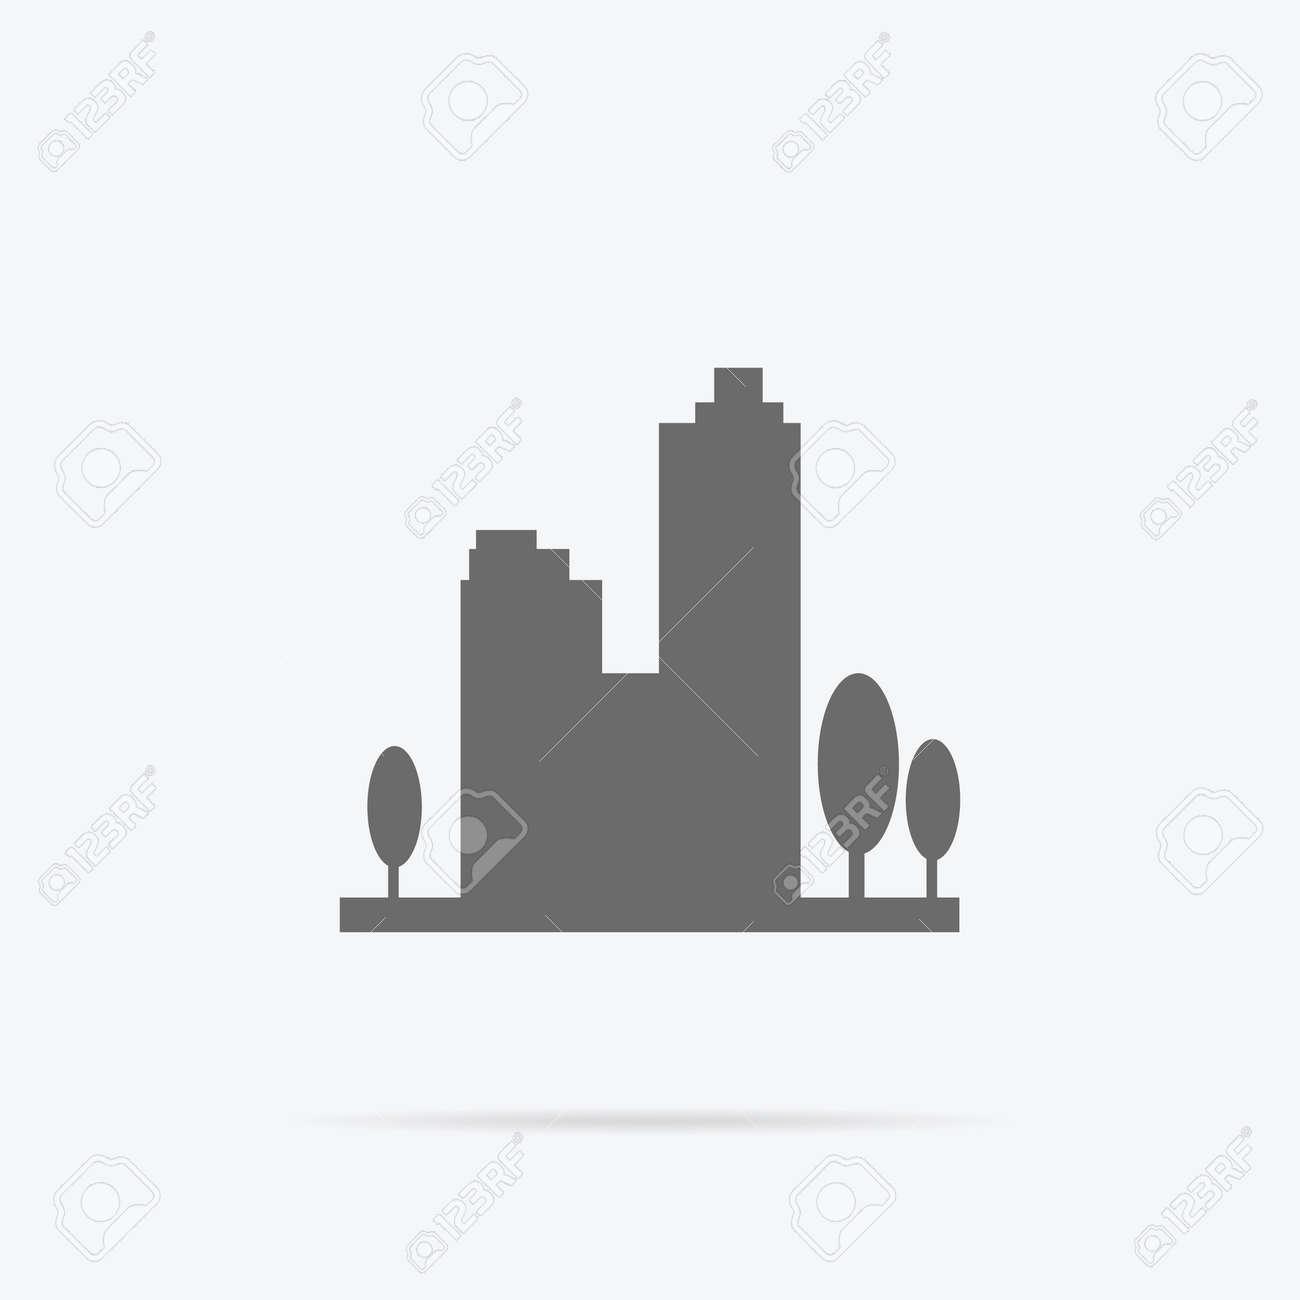 Tall buildings Royalty Free Vector Image - VectorStock